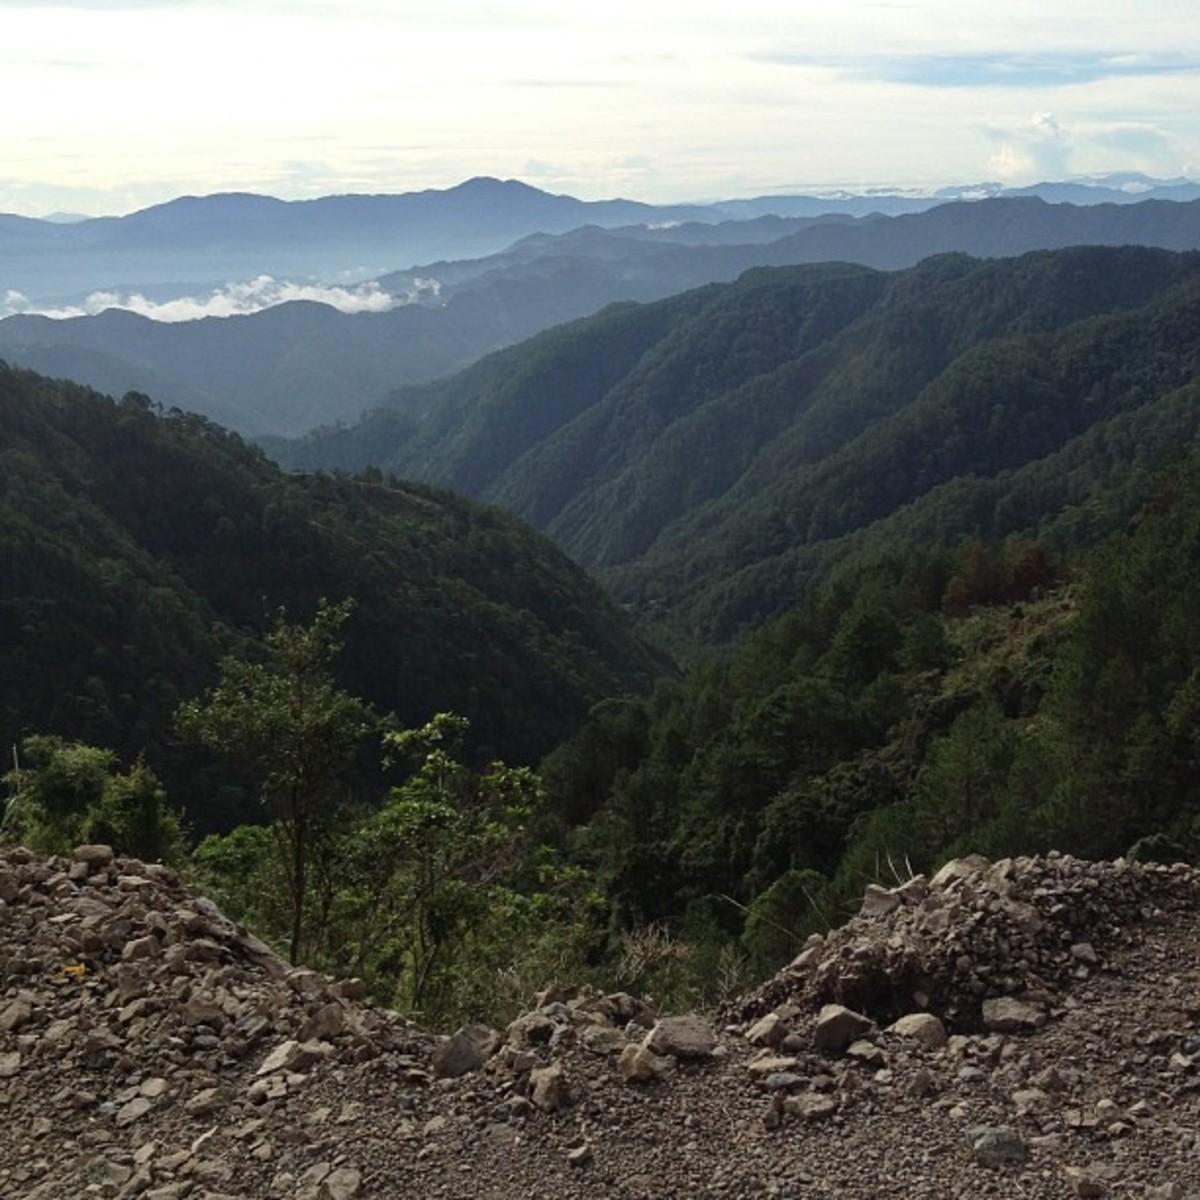 On the climb, 3